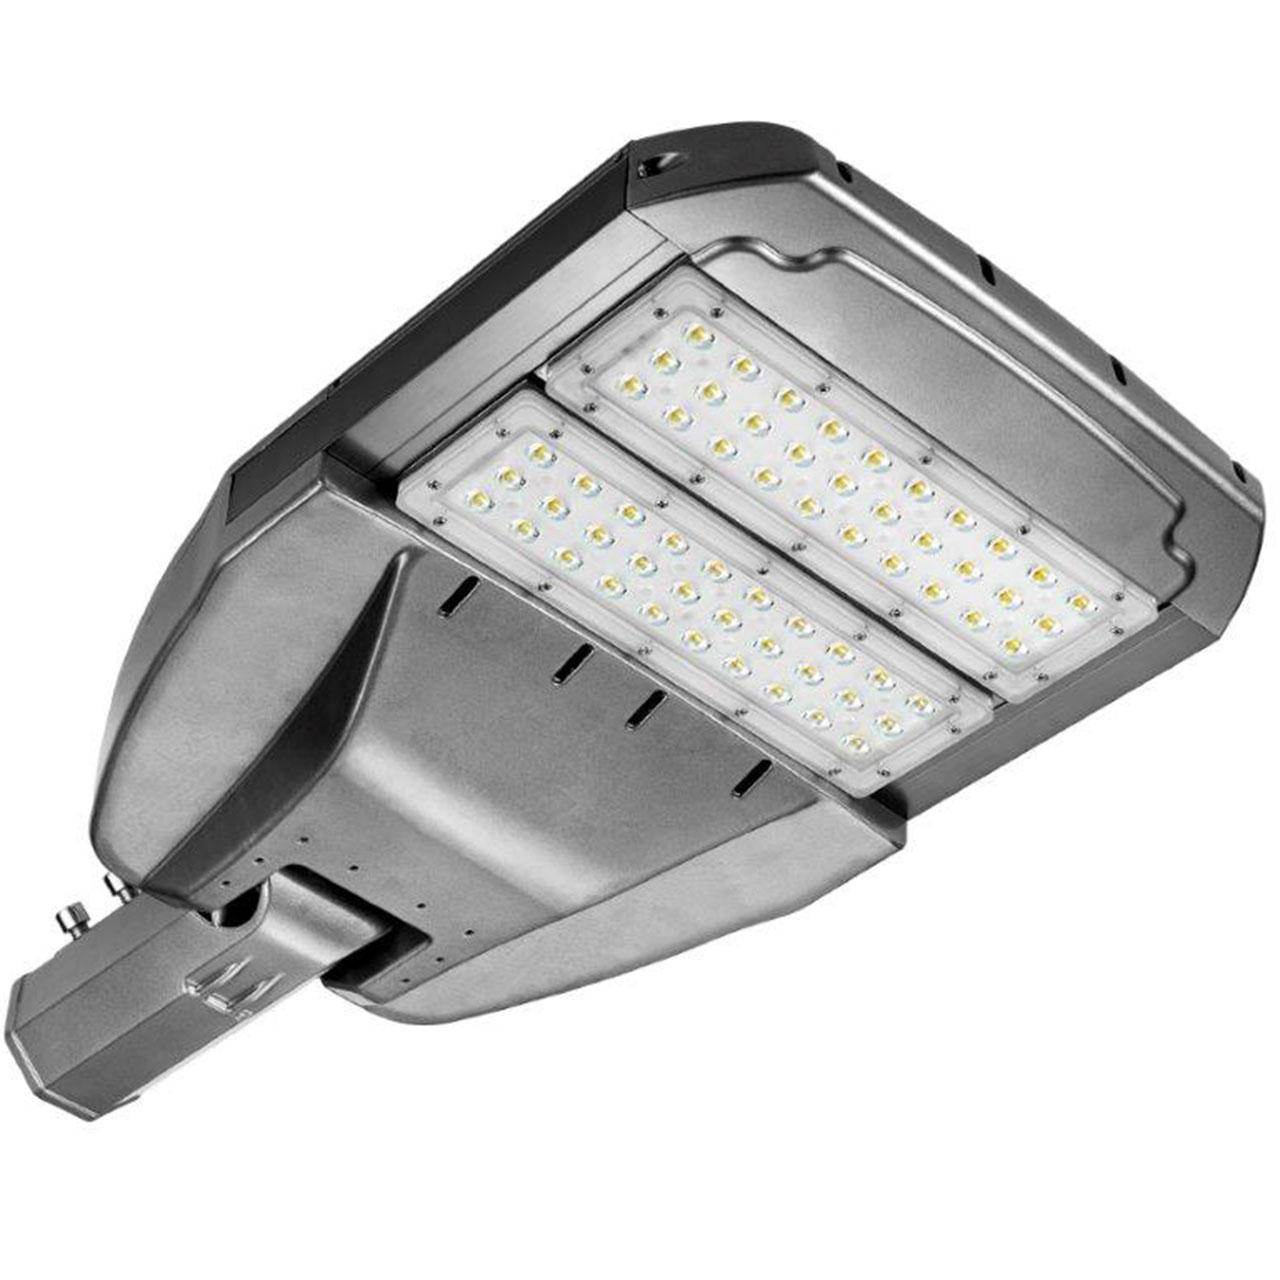 MUVA LED – LED Strassenbeleuchtung 240W